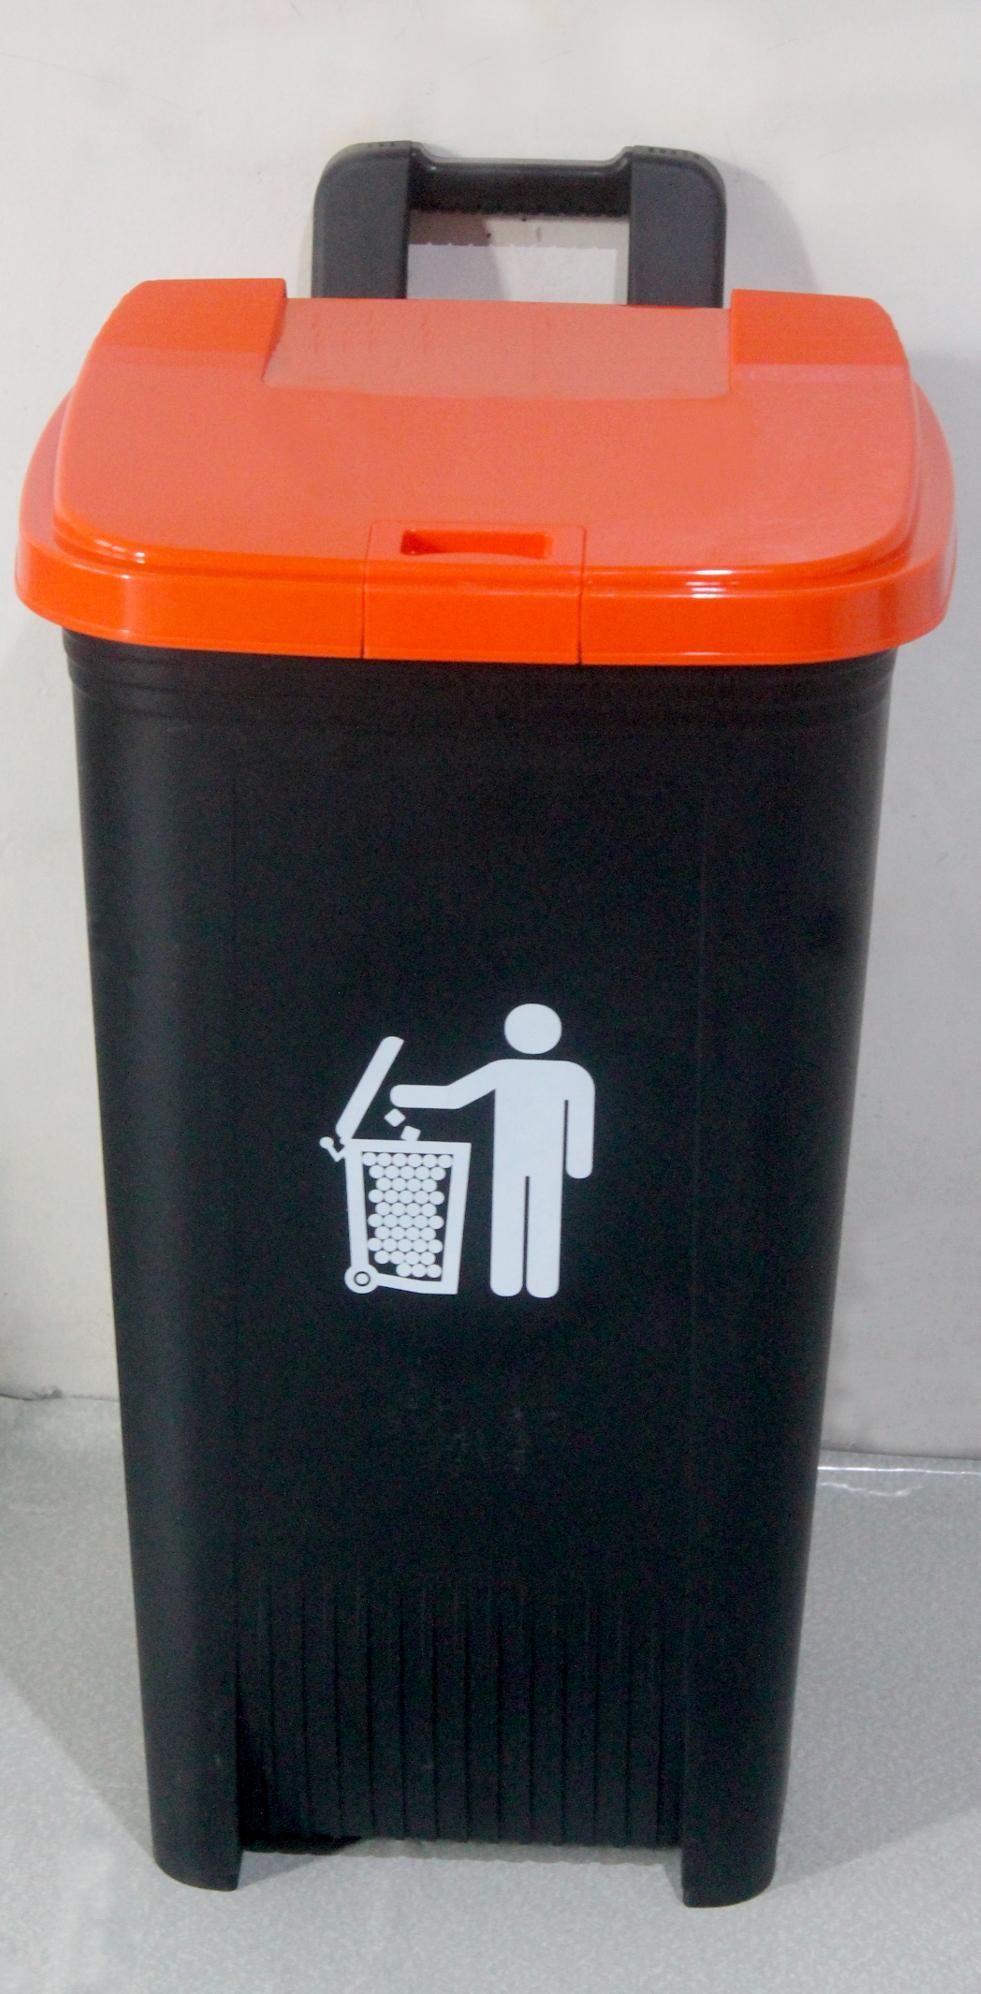 Stainless Trash Can Steel Fingerprint Proof Erfly Metal Outdoor